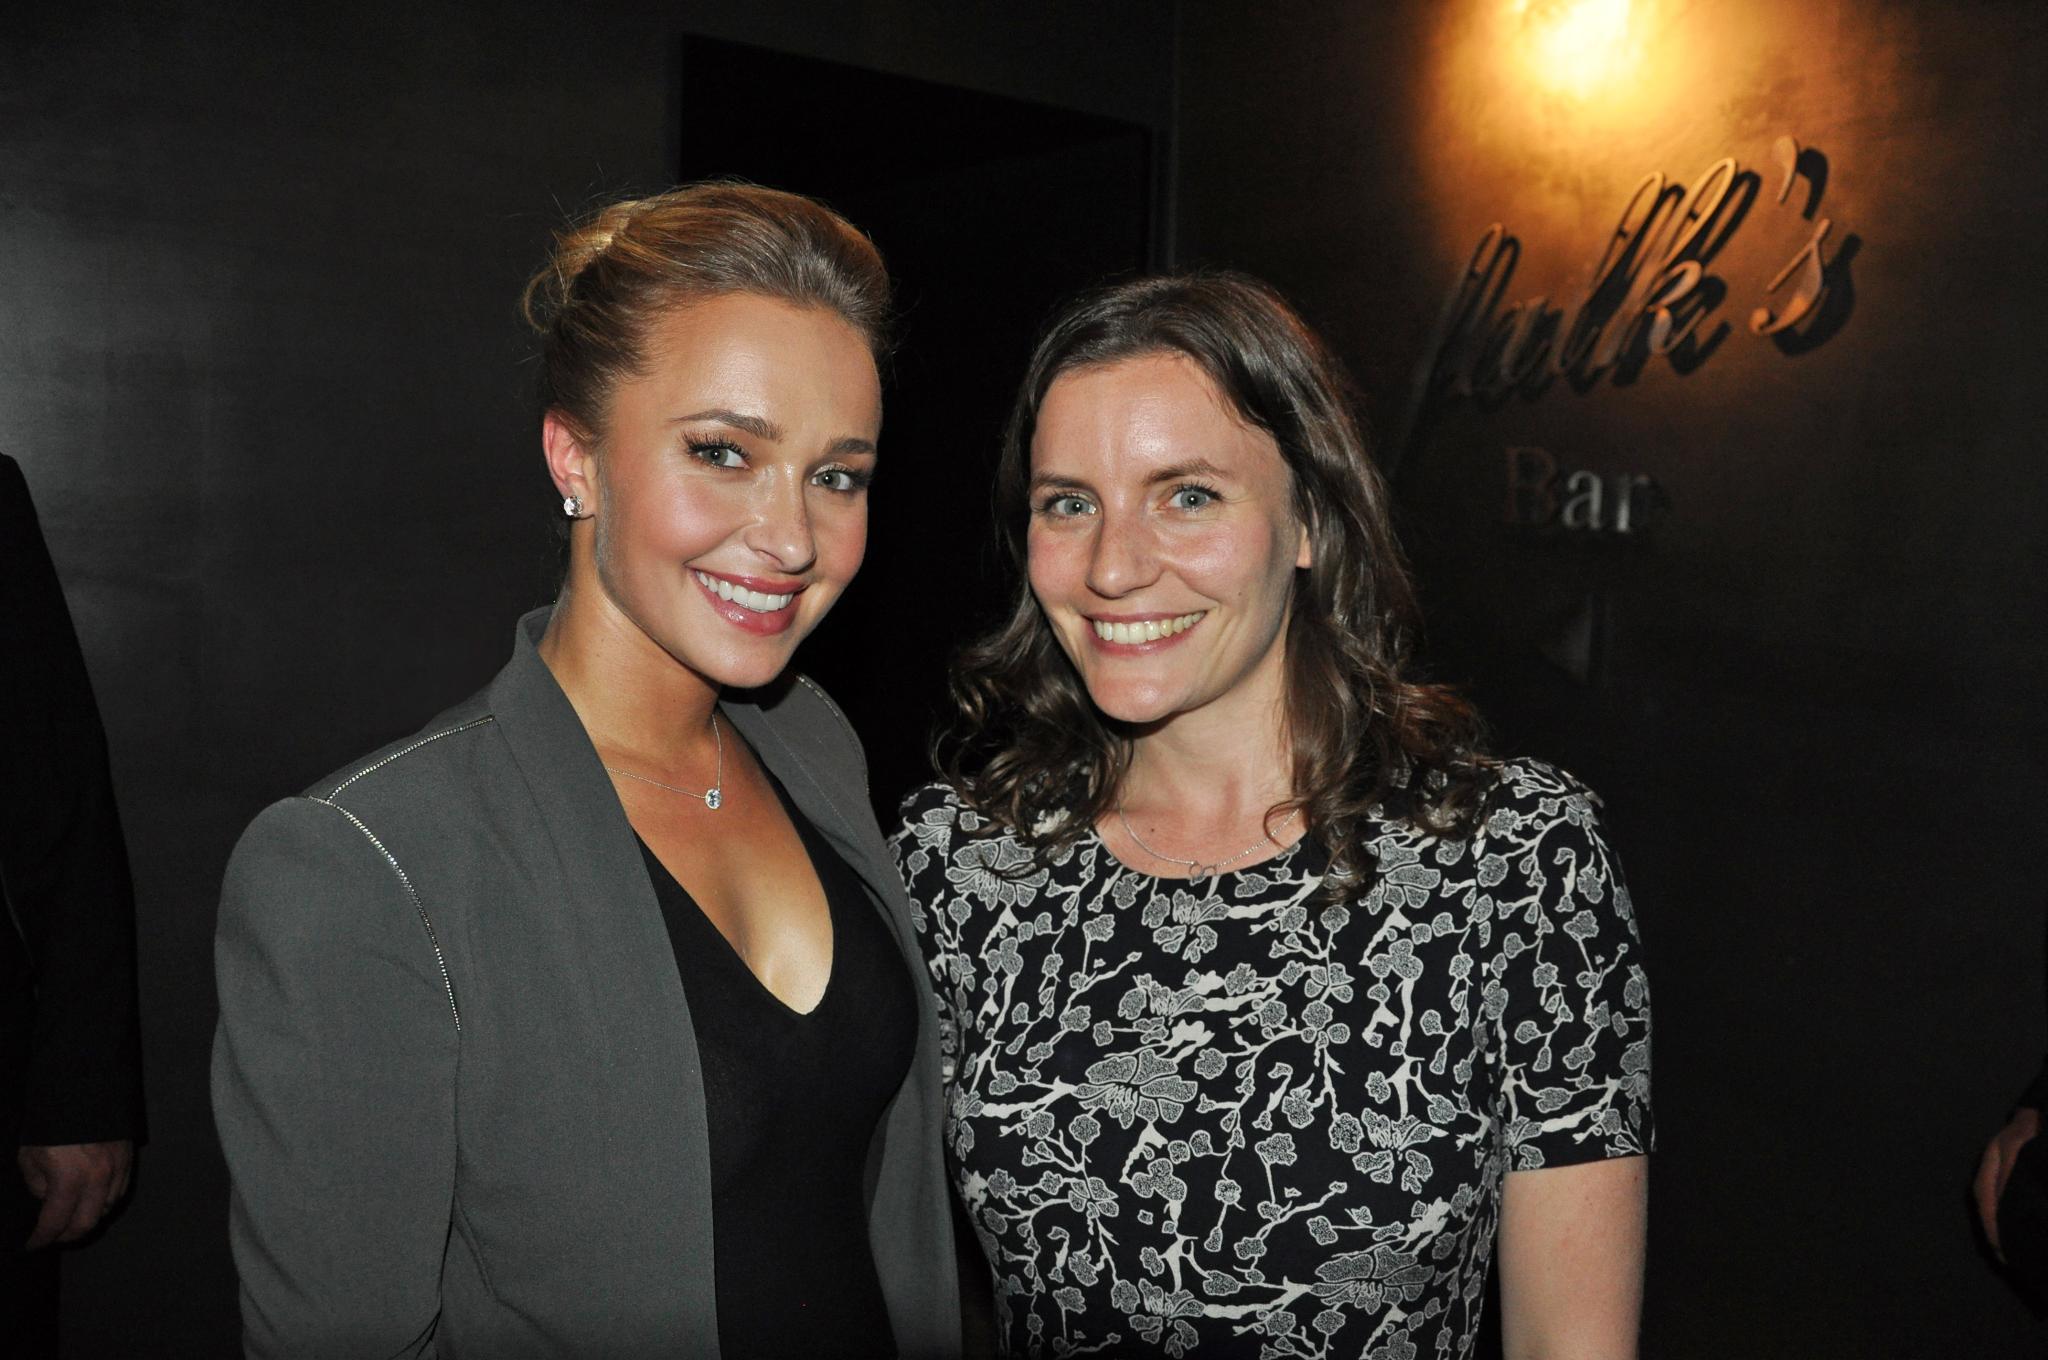 Gala.de-Redakteurin Sarah Stendel traf Hayden Panettiere in München.